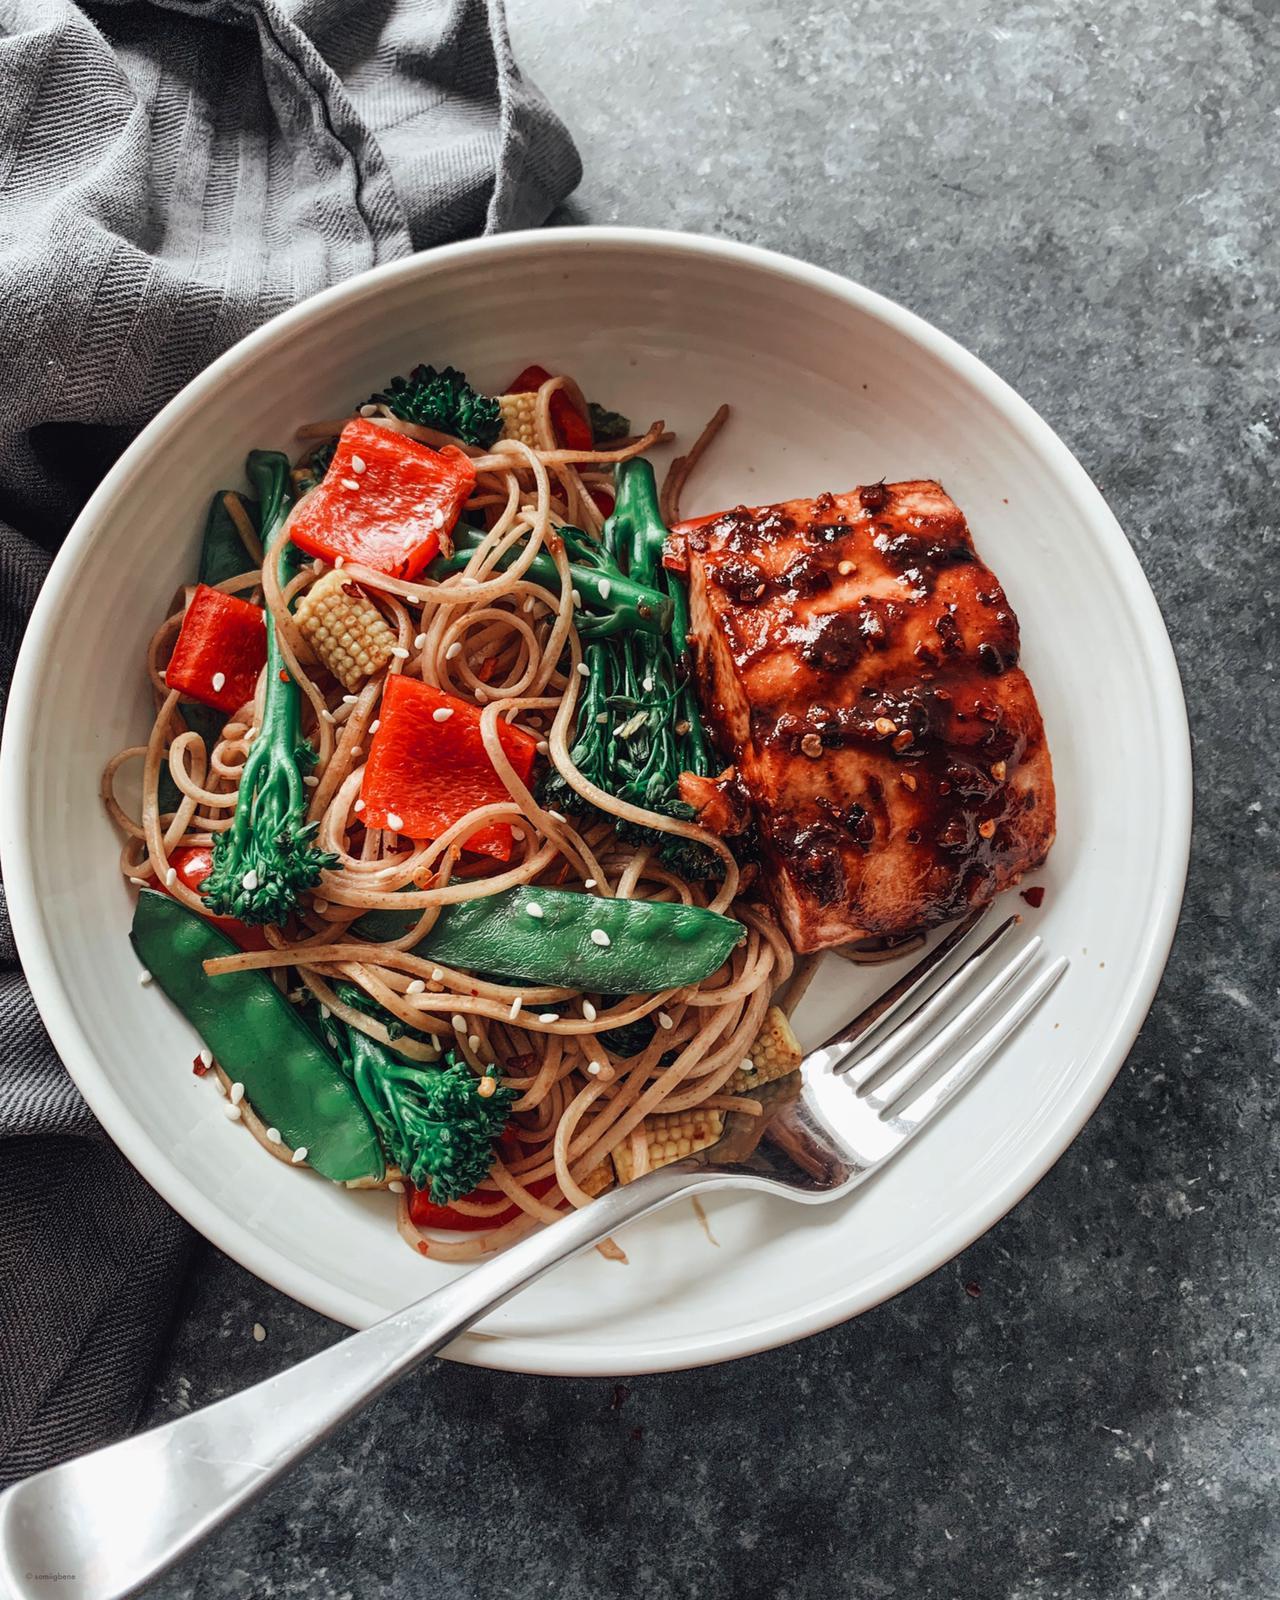 Chilli Bean Wild Salmon with Veggie Noodle Stir-Fry